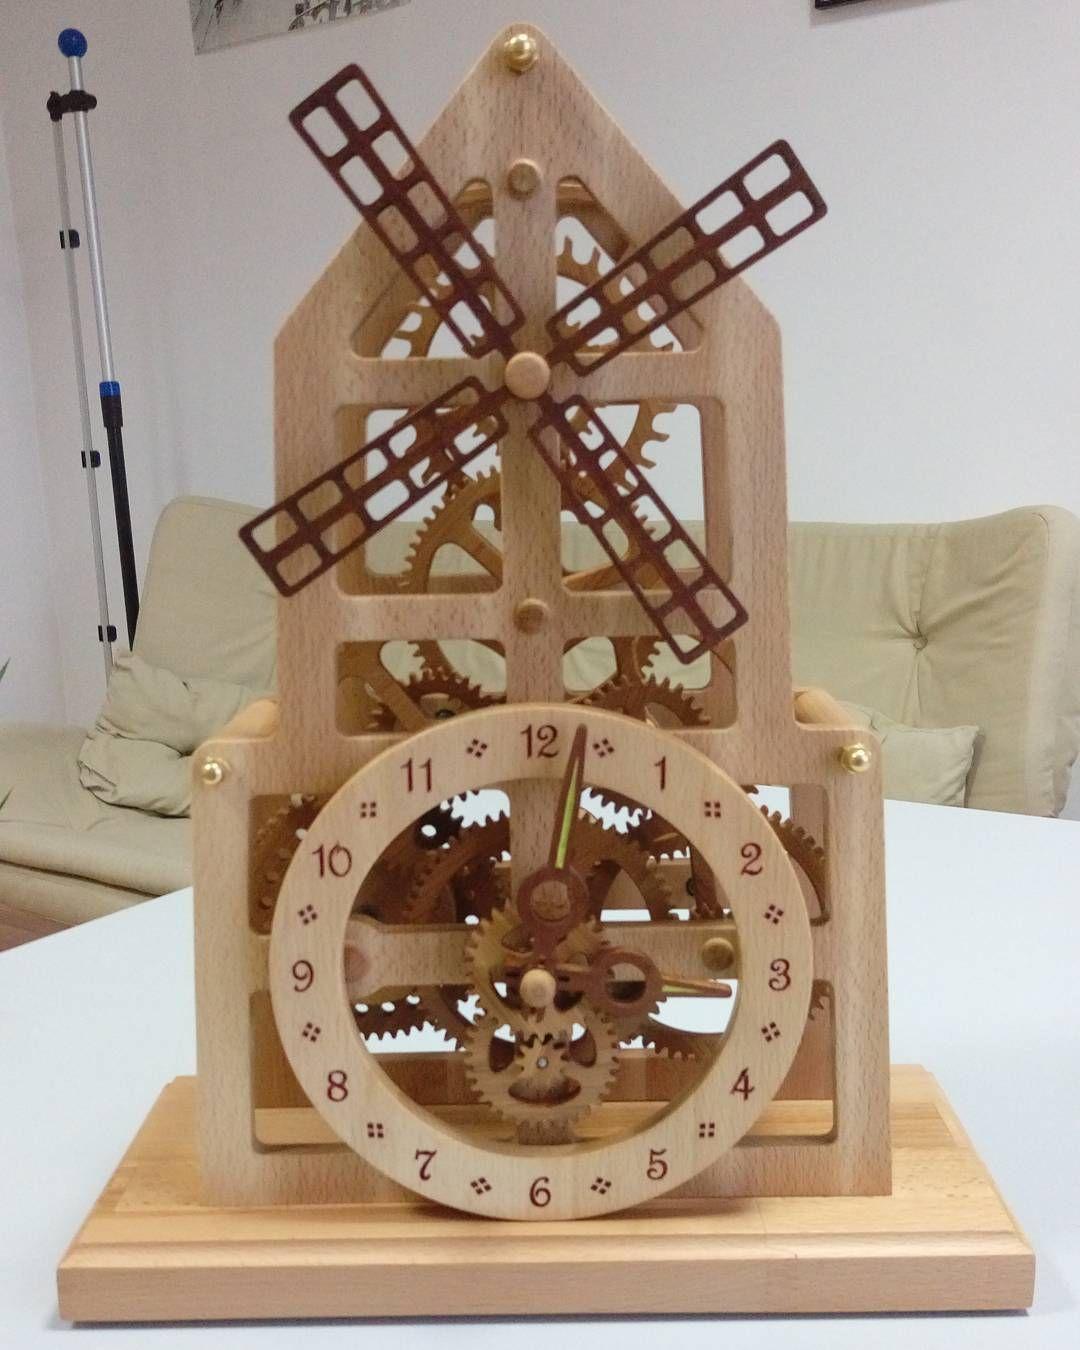 Wooden Table Clock Windmill Tandwielen Klok Projecten